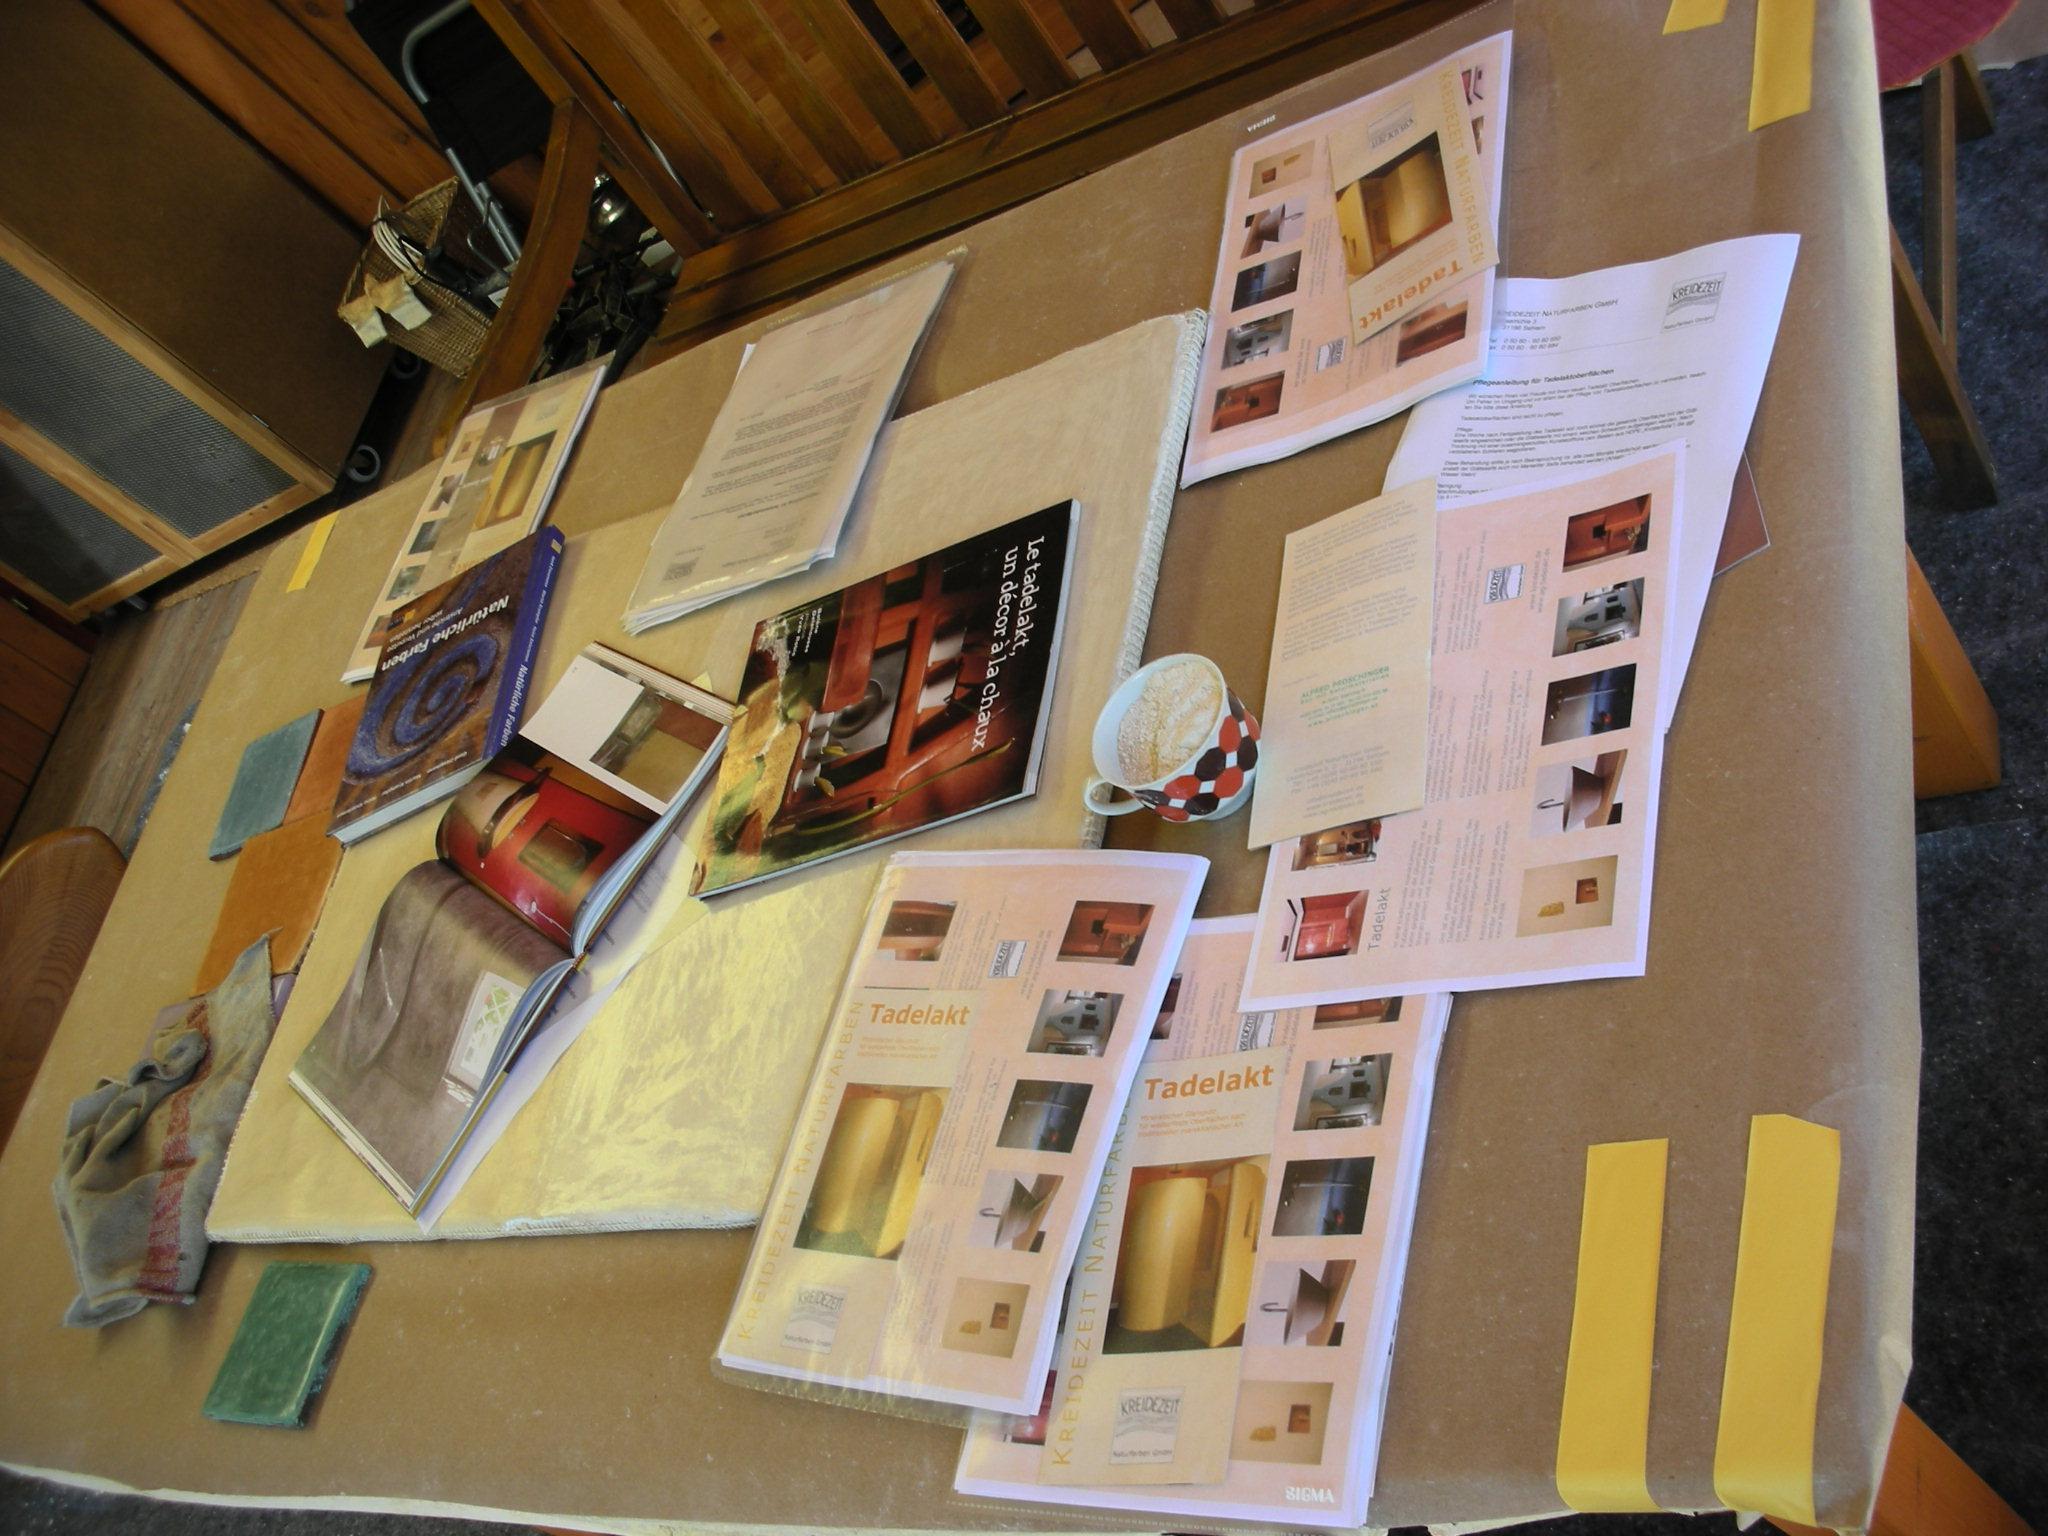 Tadelakt Workshop 2009 Büchertisch